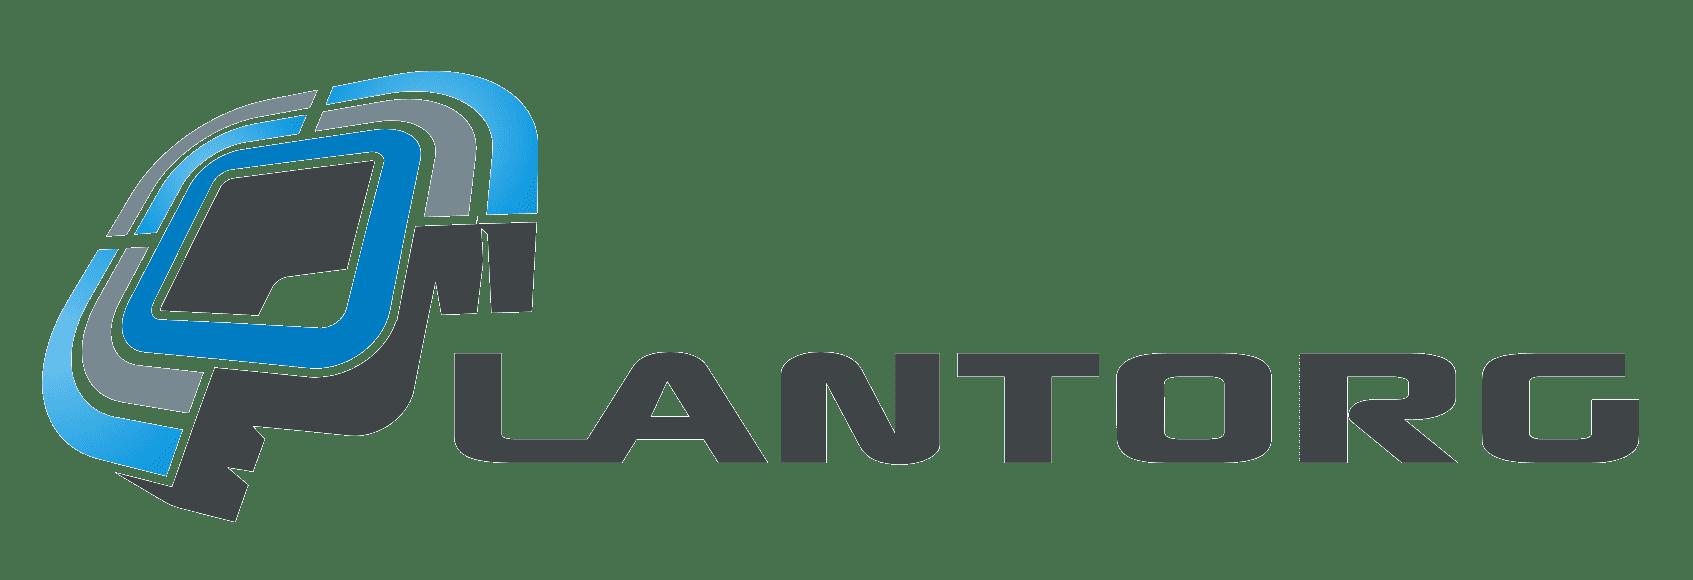 lantorg